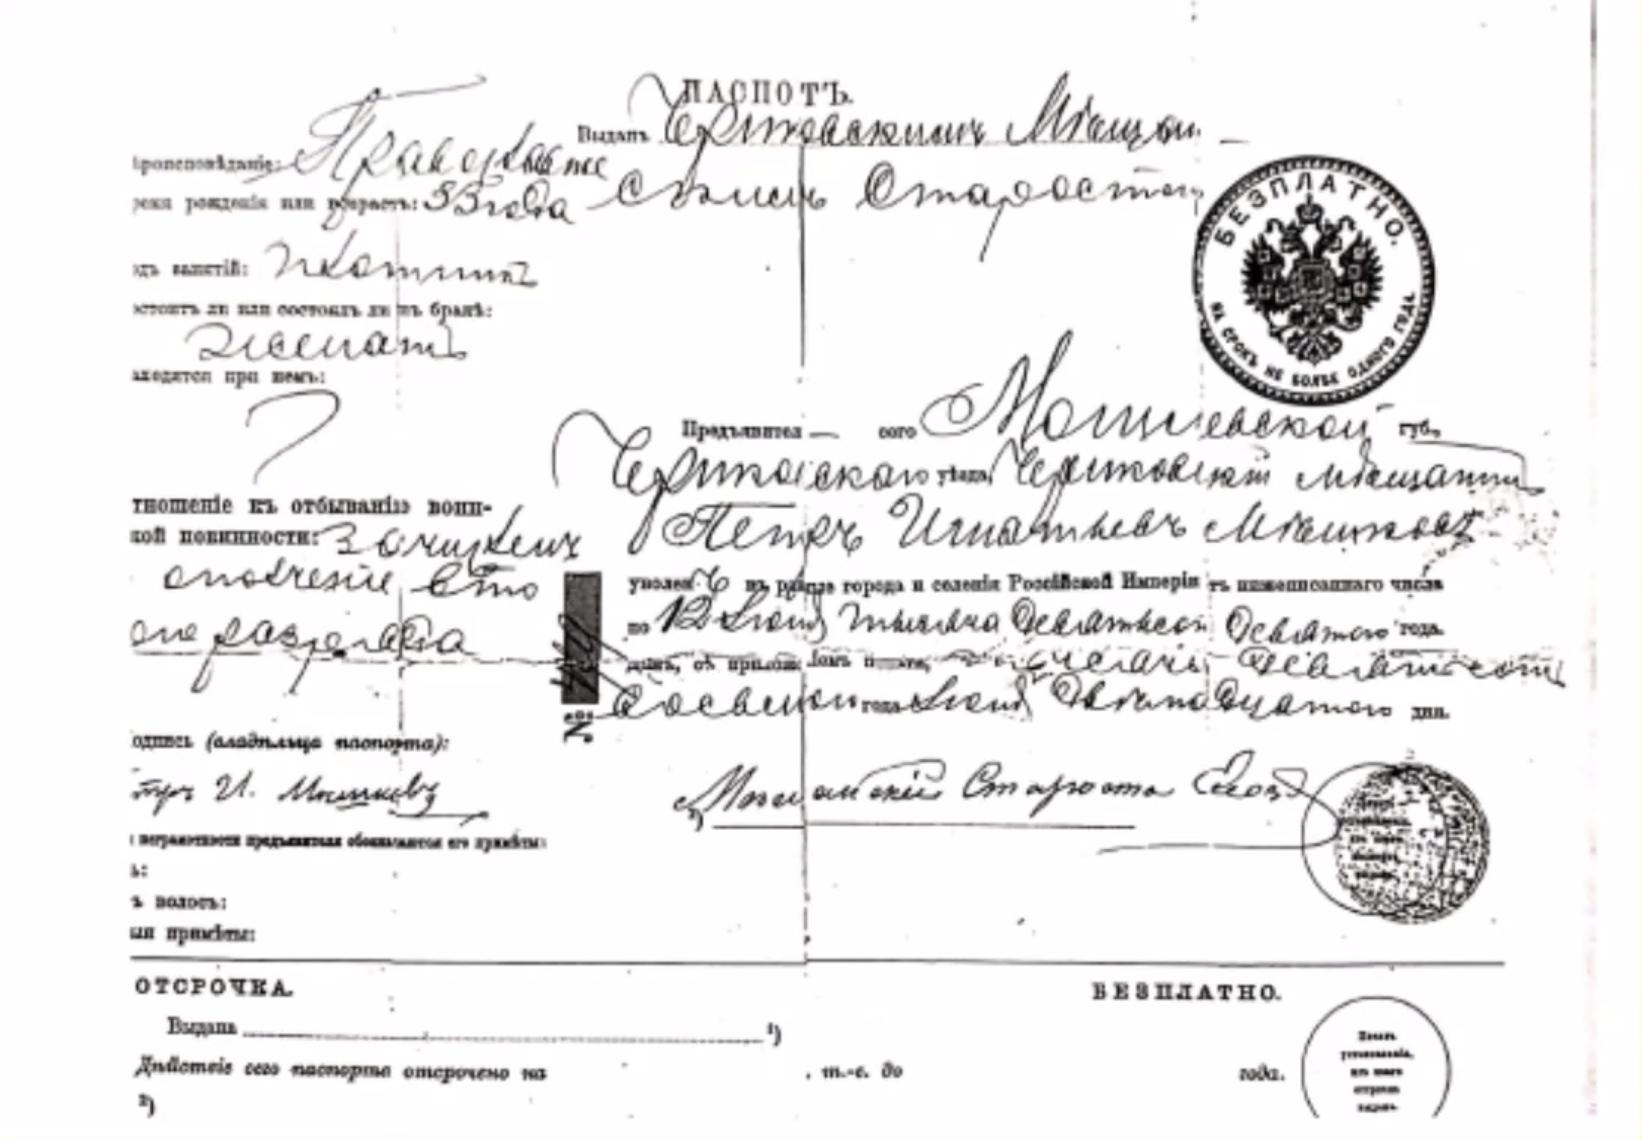 Dr. Garza Fathers Passport copy - Family brings Russian culture to Nebraska